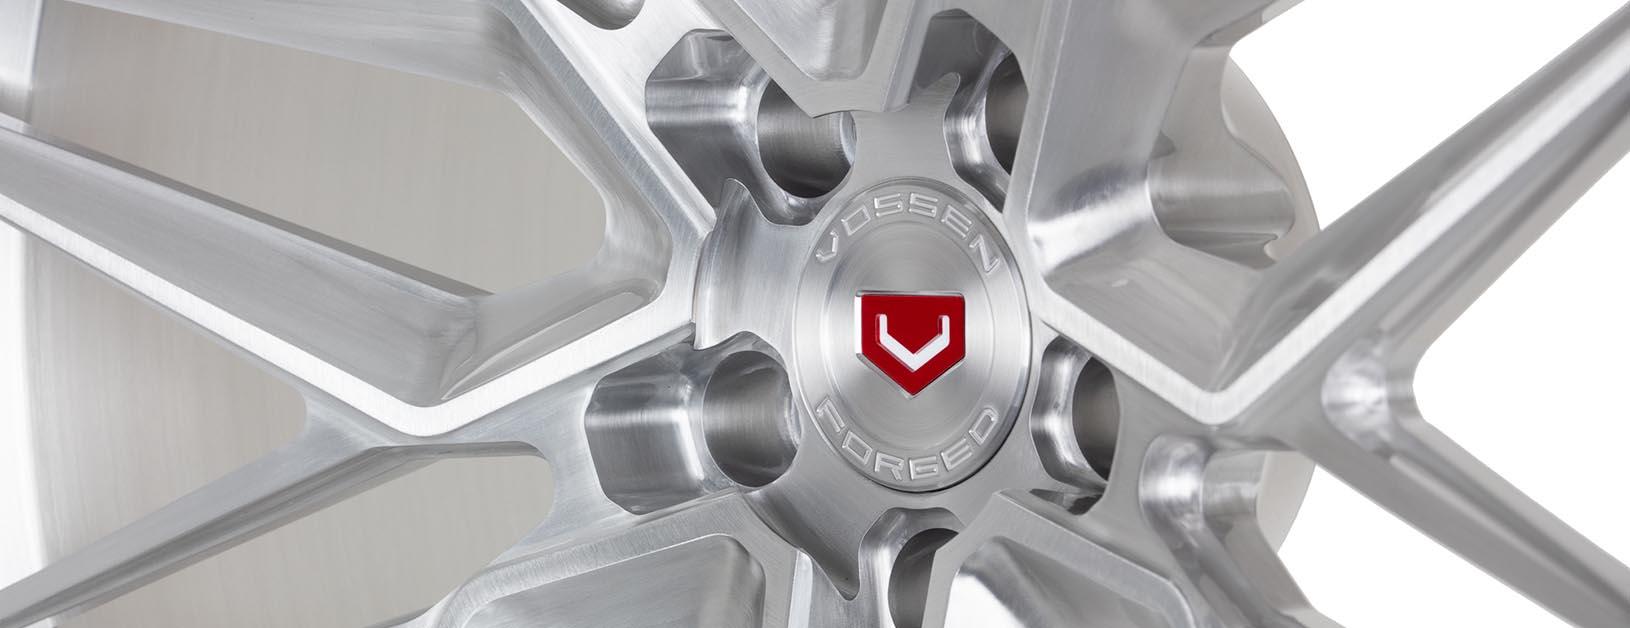 Vossen-EVO-5-C04-Gloss-Clear-Brushed-EVO-Series-©-Vossen-Wheels-2019-0037-Edit